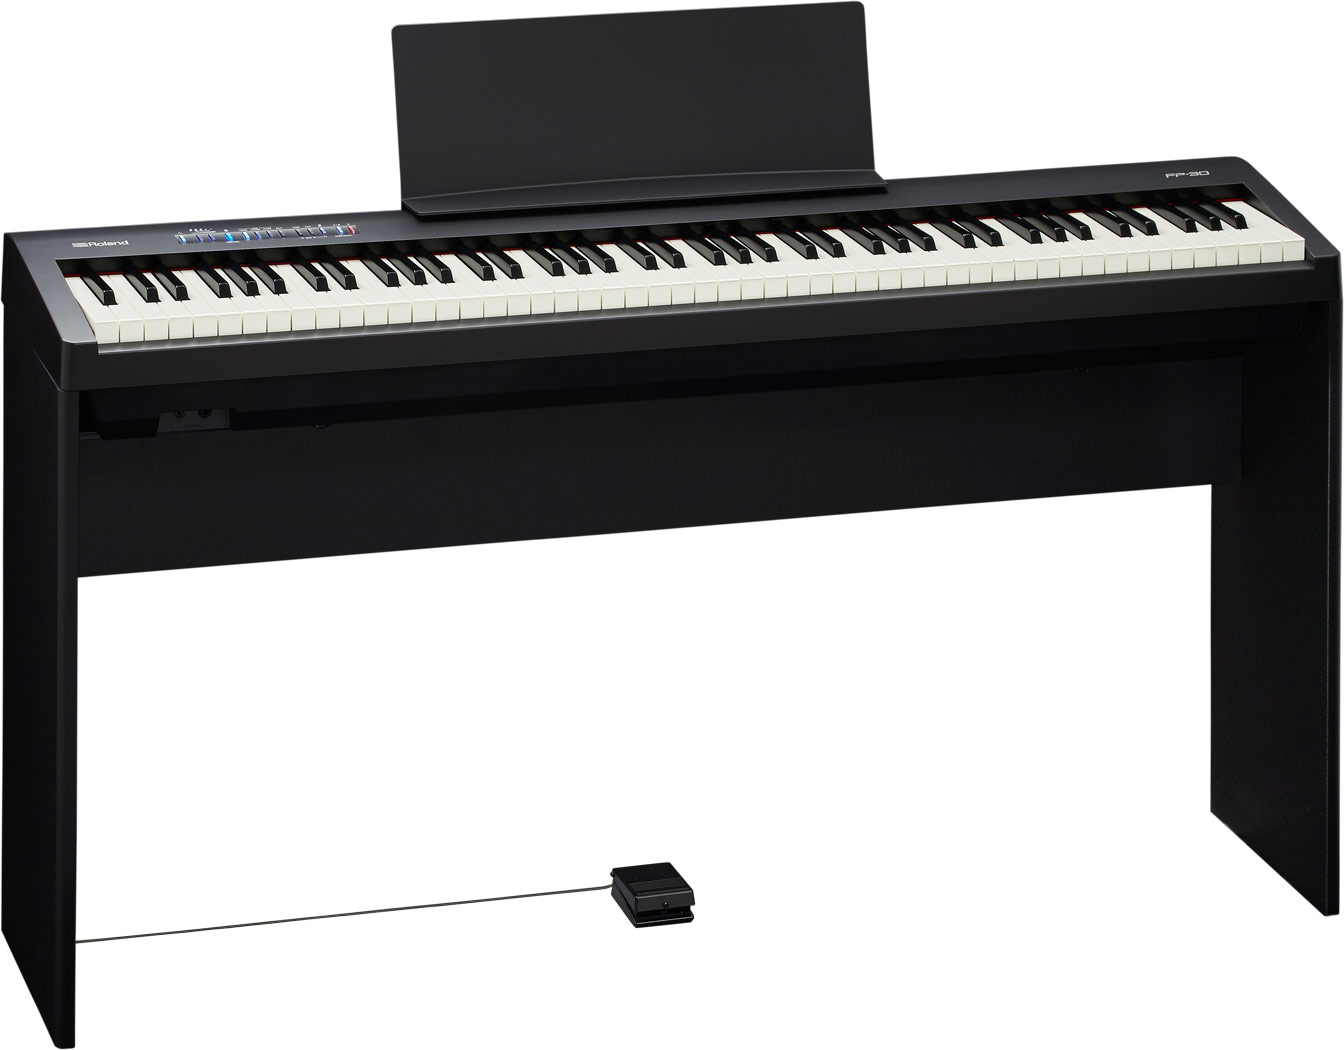 Roland Fp 30 Digital Piano